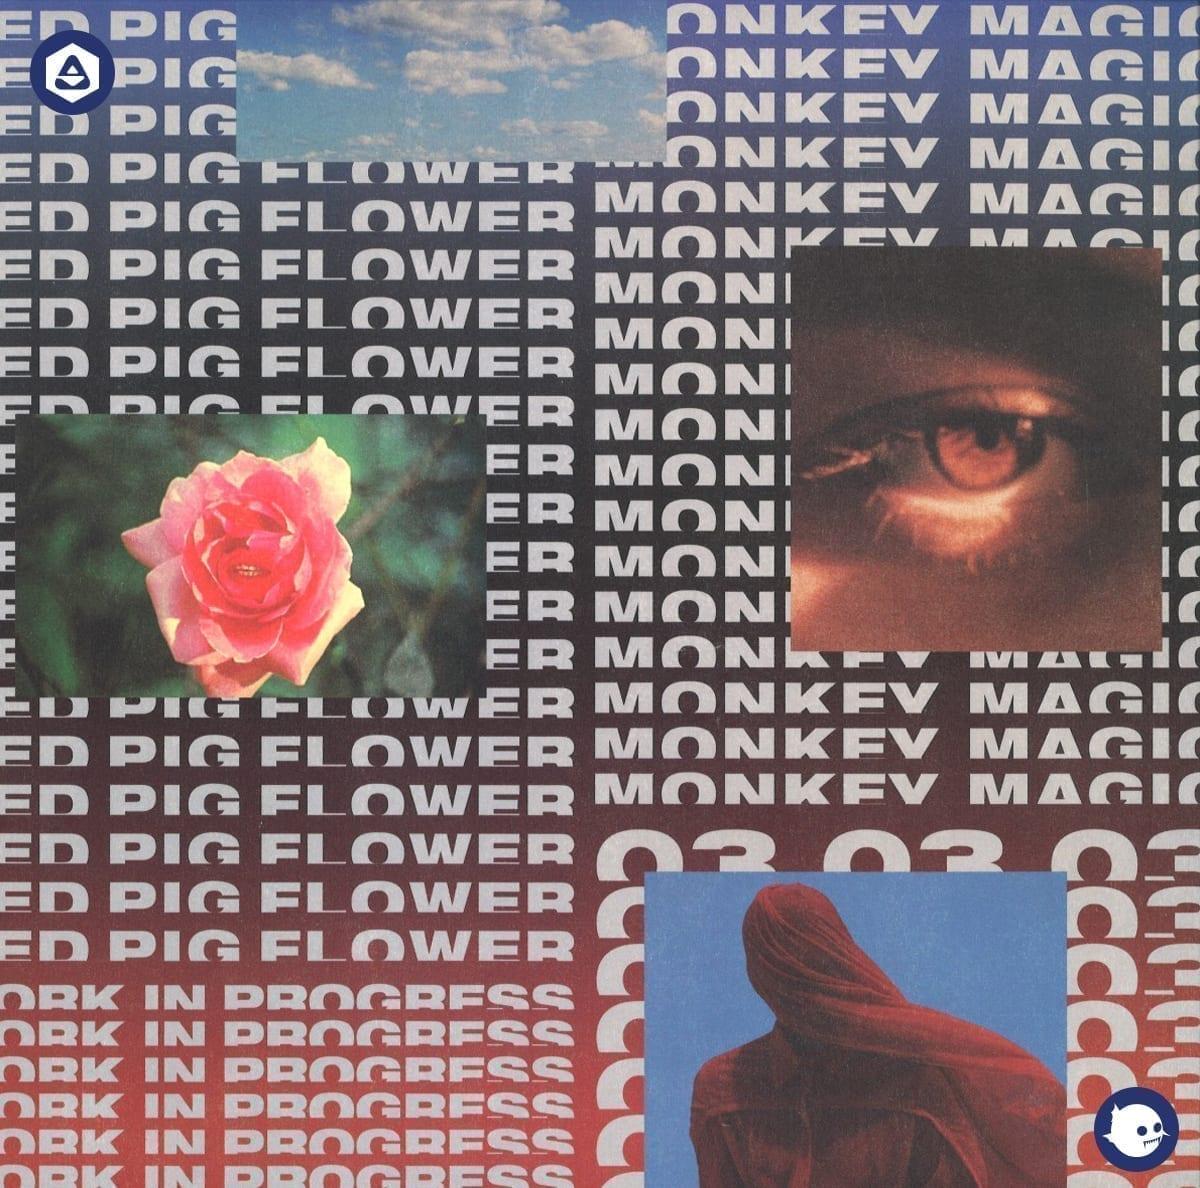 red pig flower - monkey magic 01